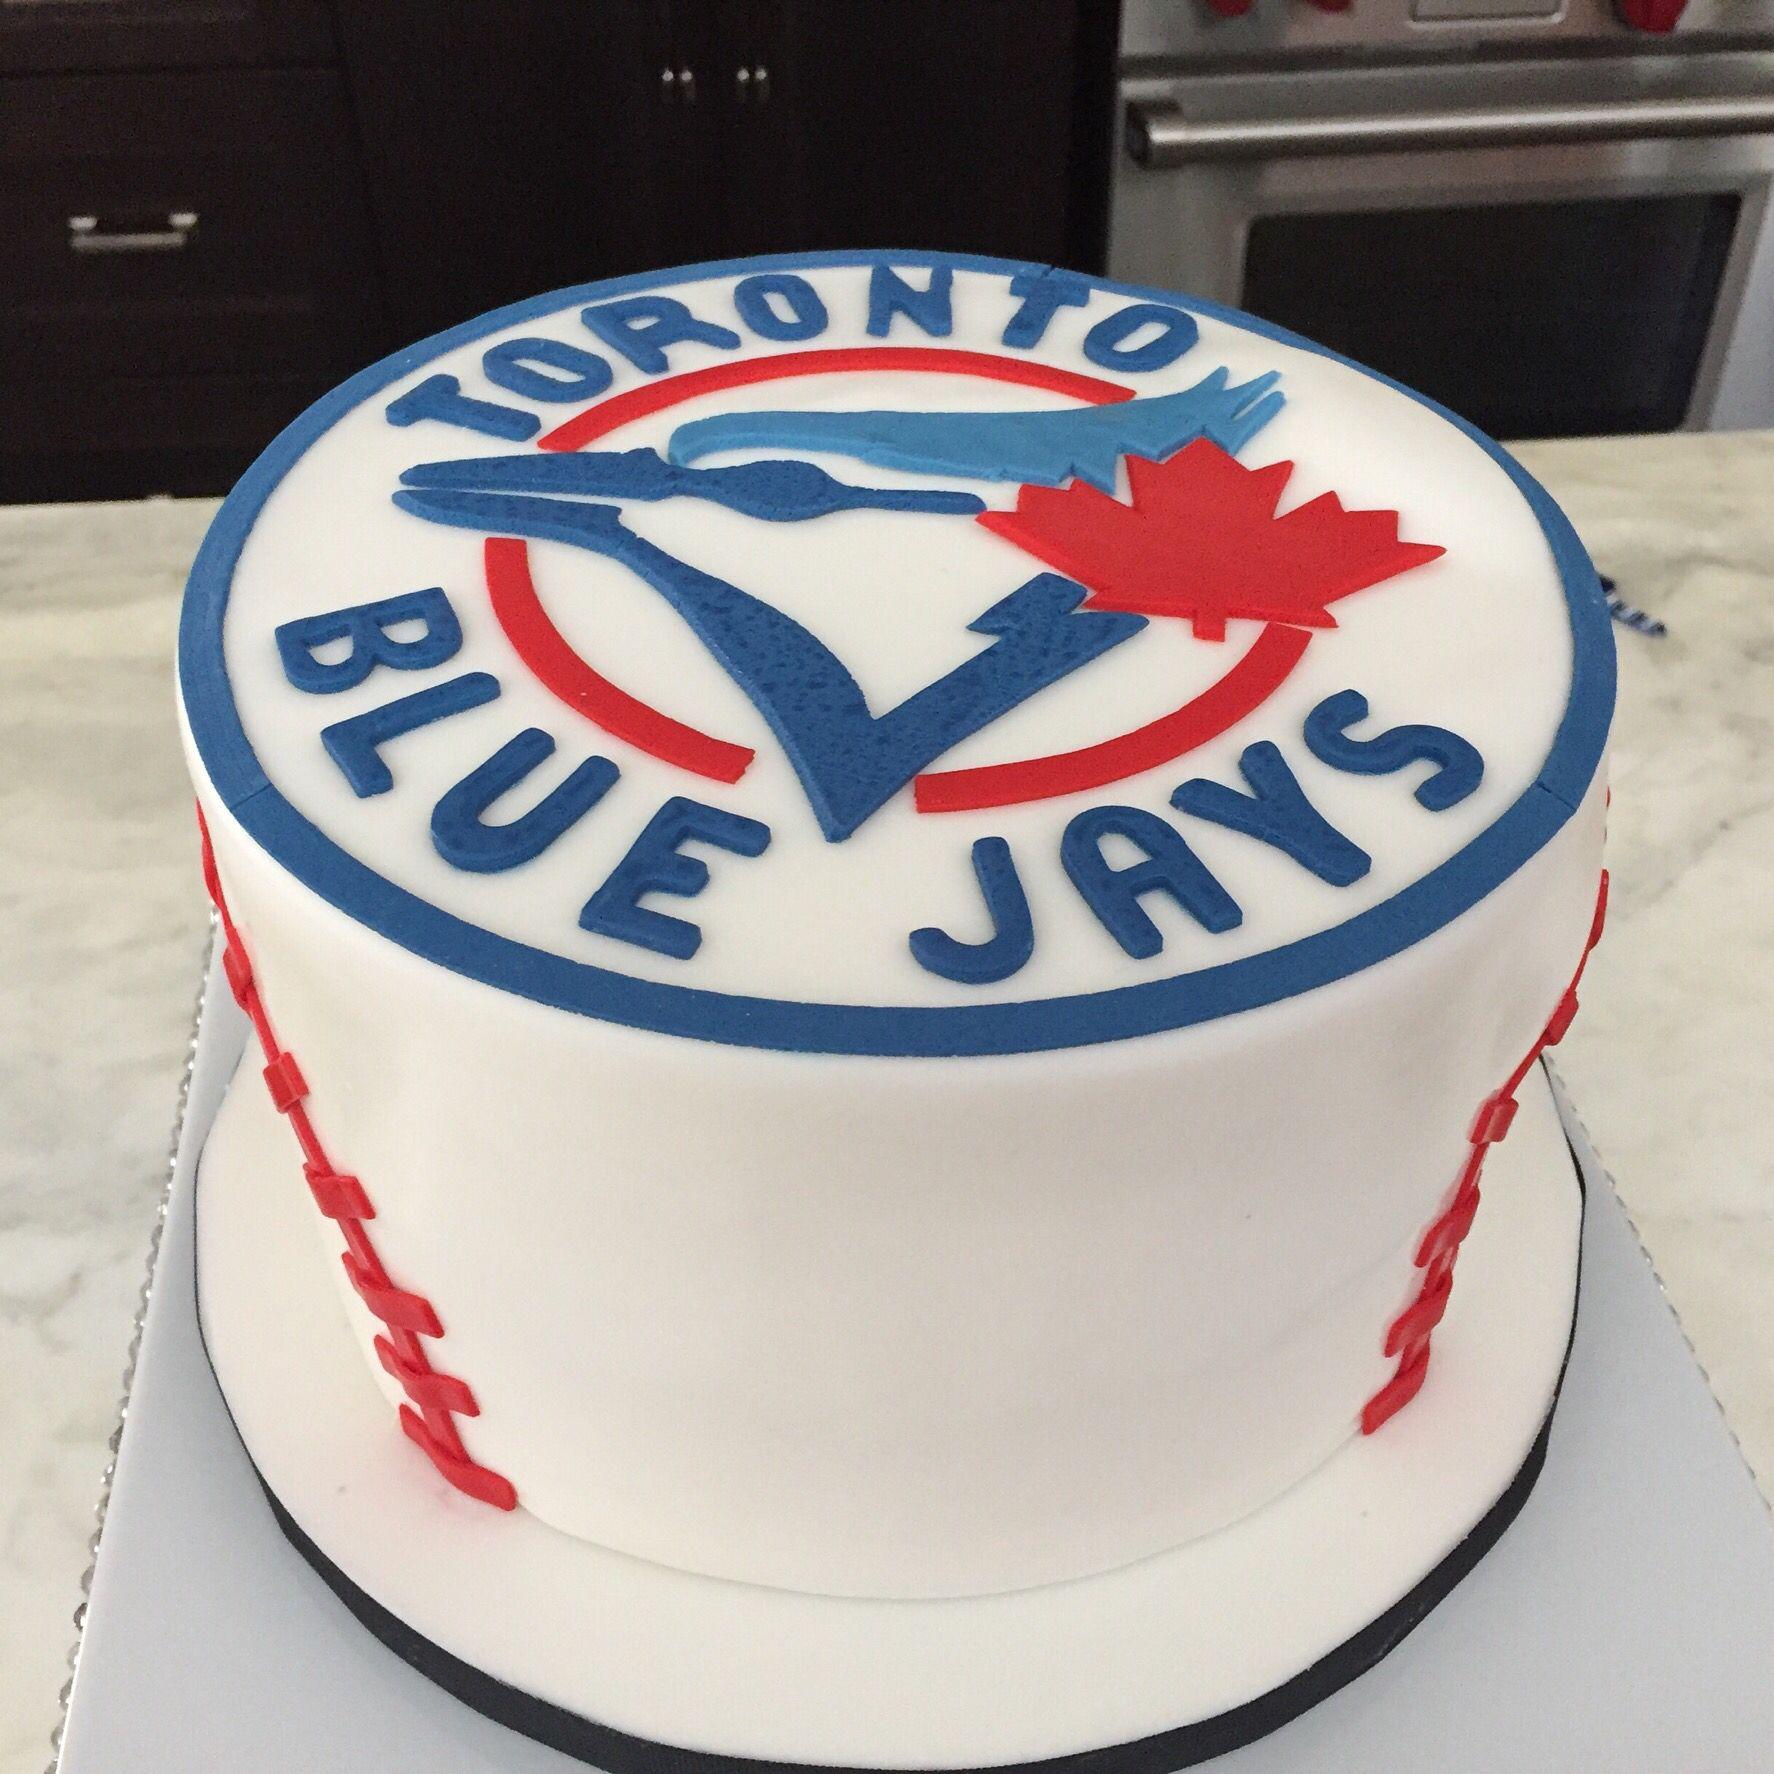 Blue jays cake for my husbands birthday Cakes Pinterest Jay